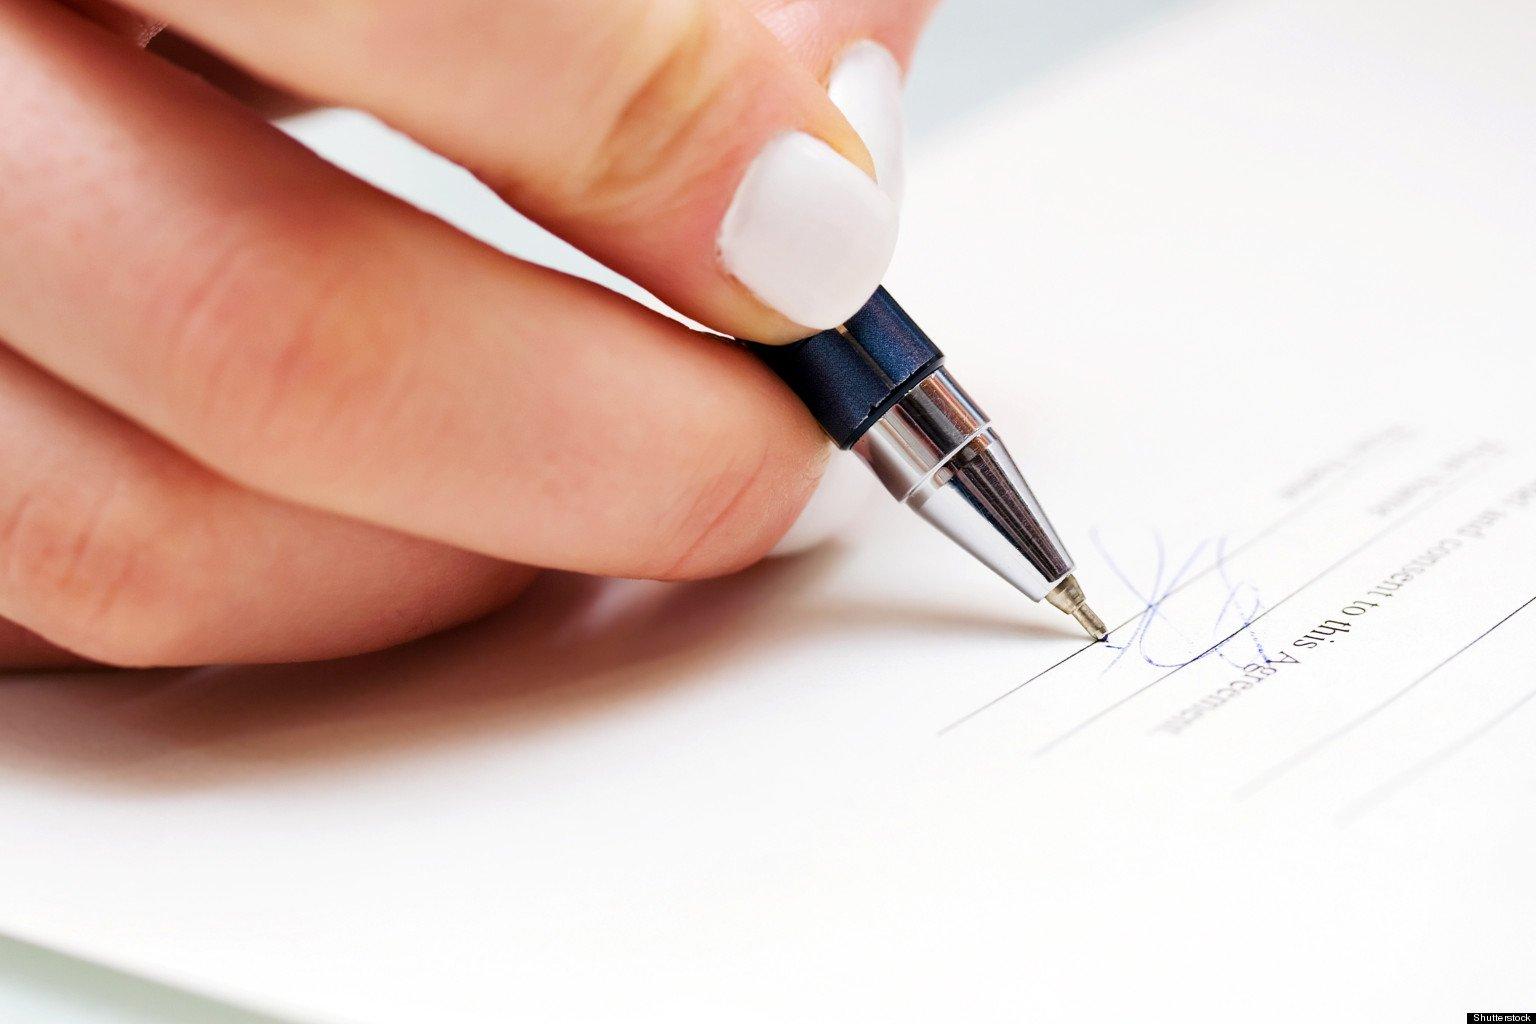 Woman writing signature on document